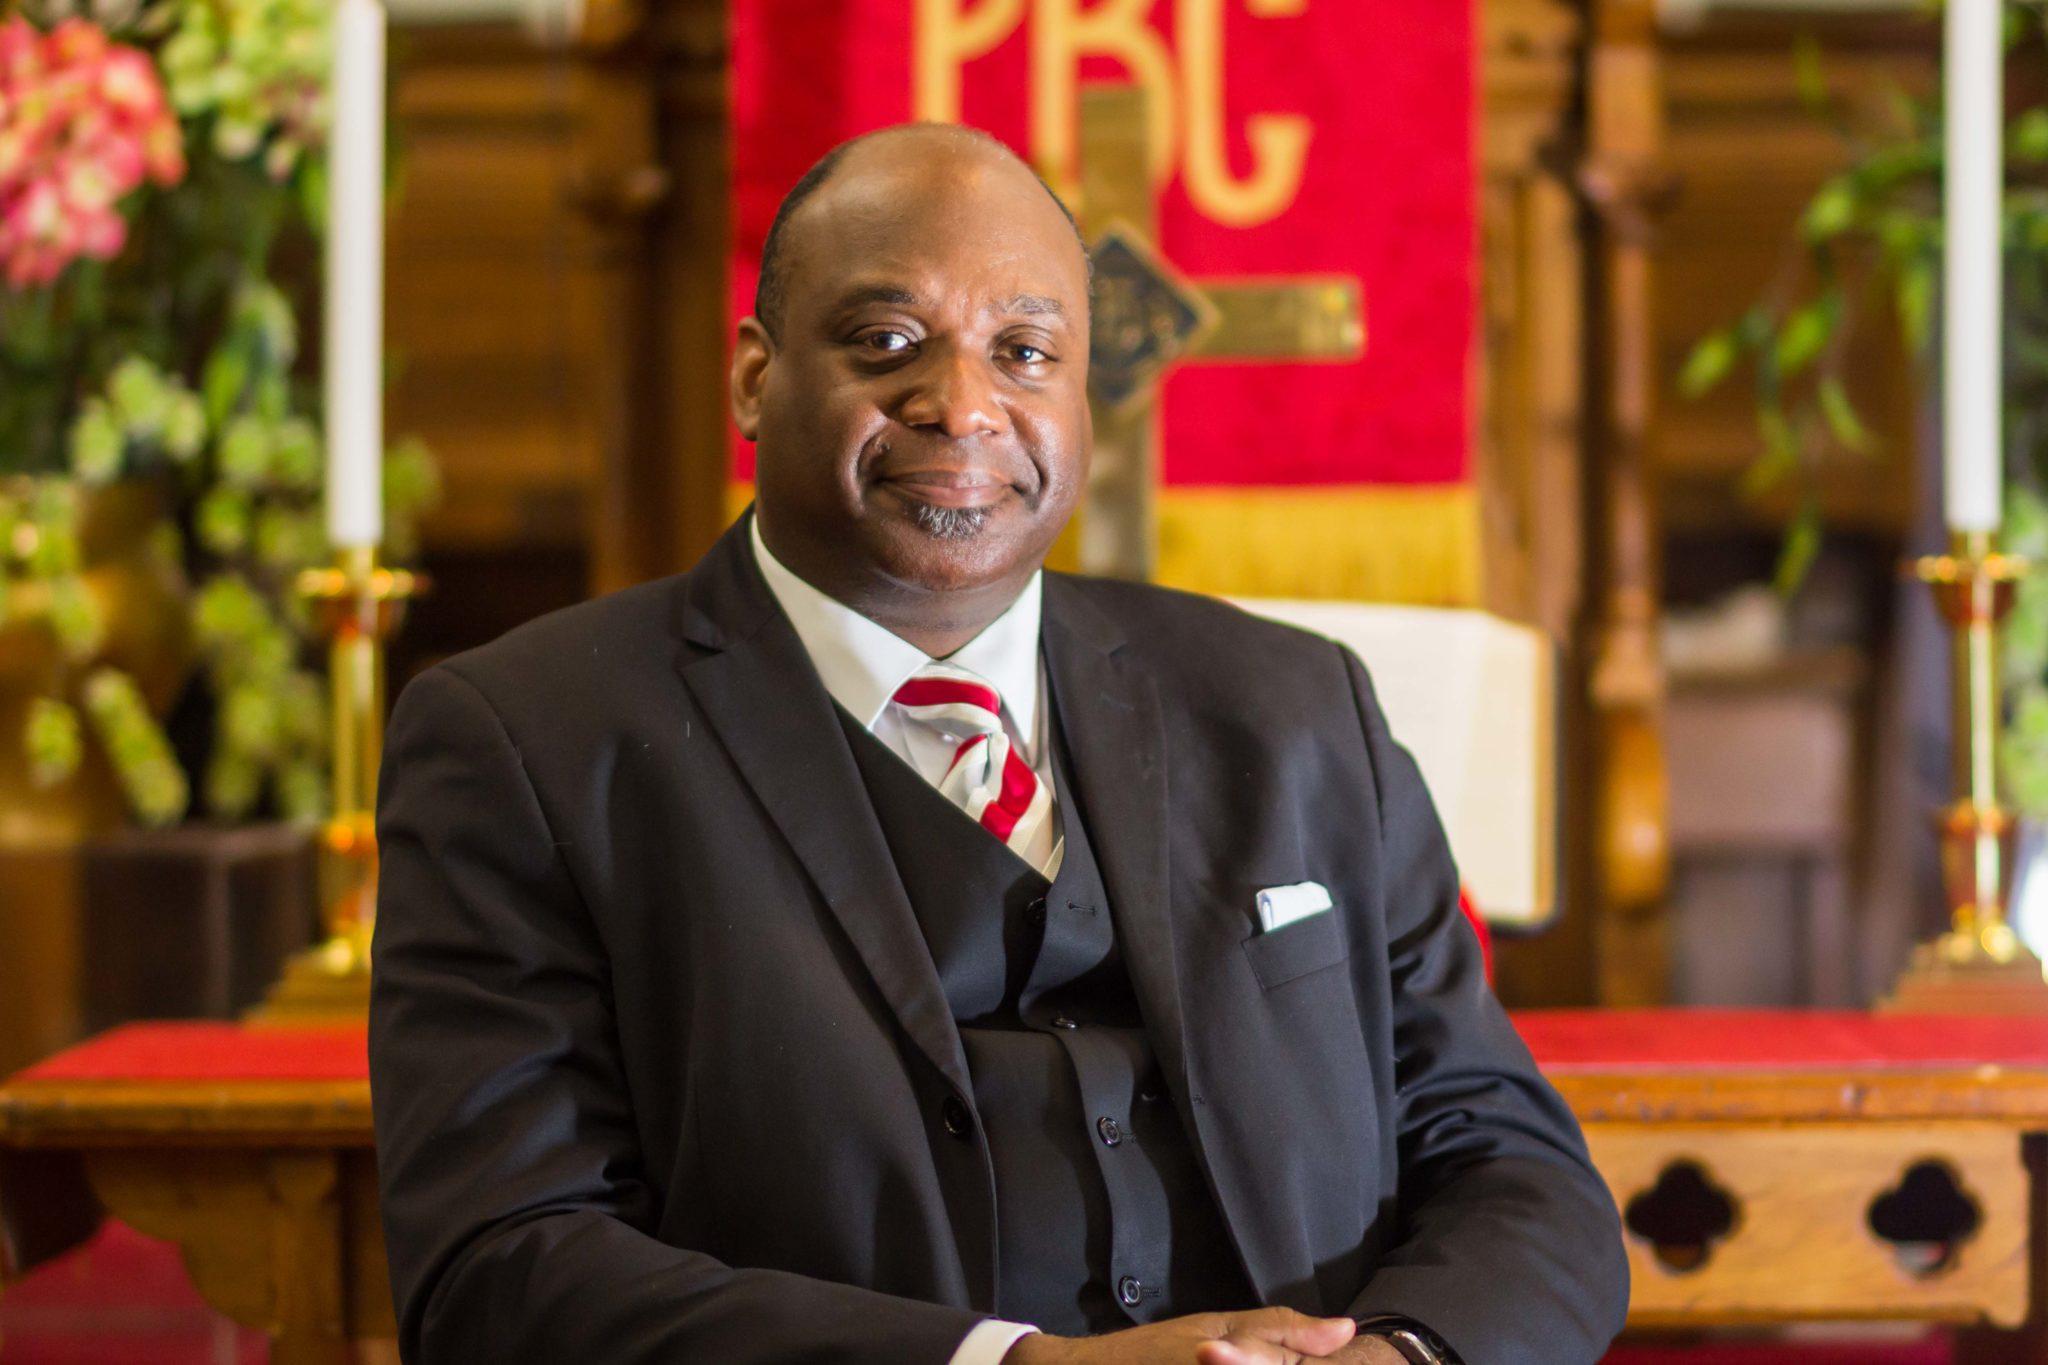 Rev. Dr. Charles Gill